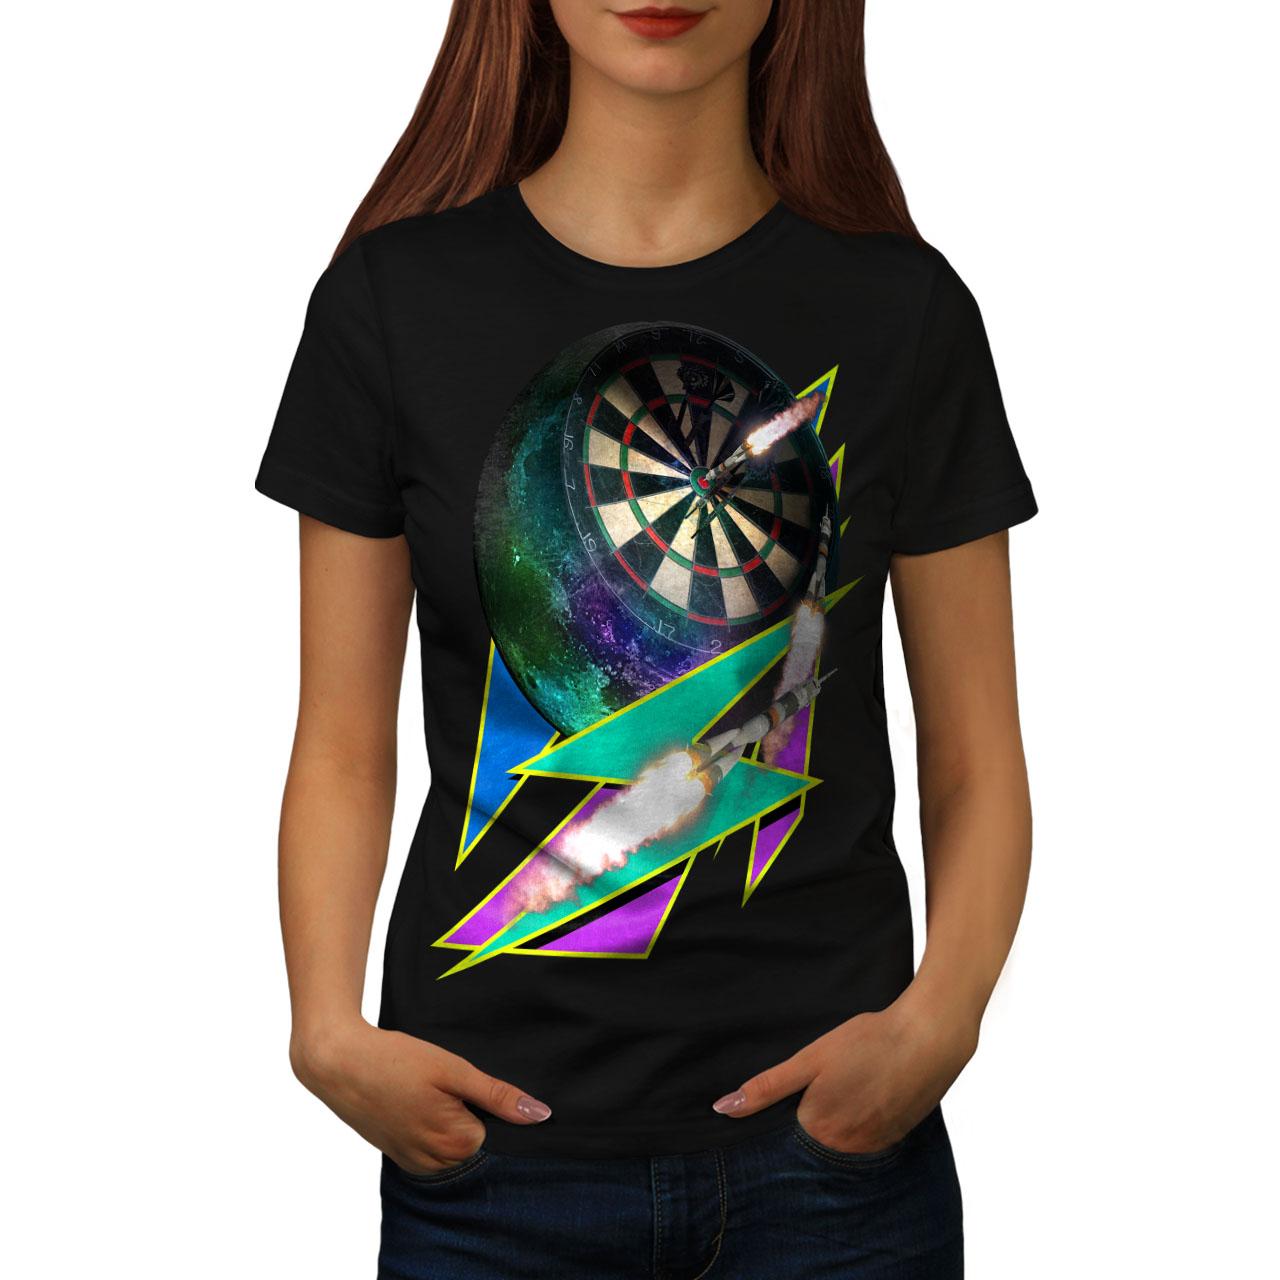 miniature 3 - Wellcoda Dart Board Gaming Womens T-shirt, Achieve Casual Design Printed Tee